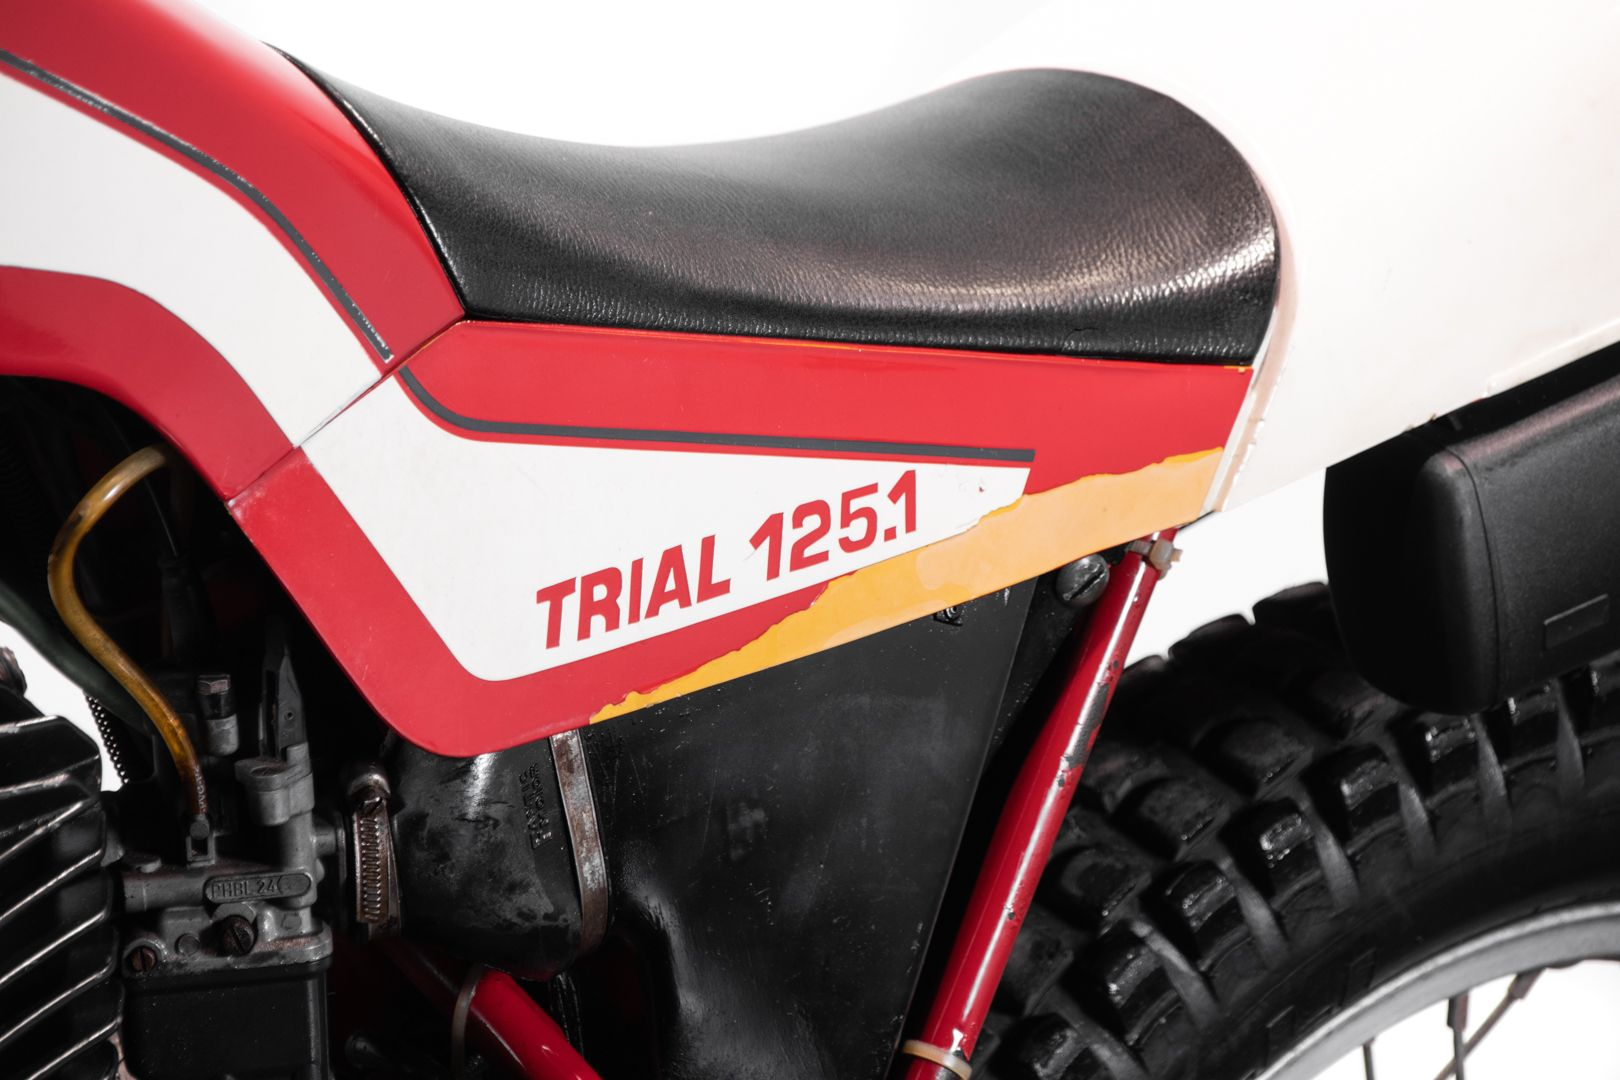 1986 Fantic Motor Trial 125 Professional 237 69035